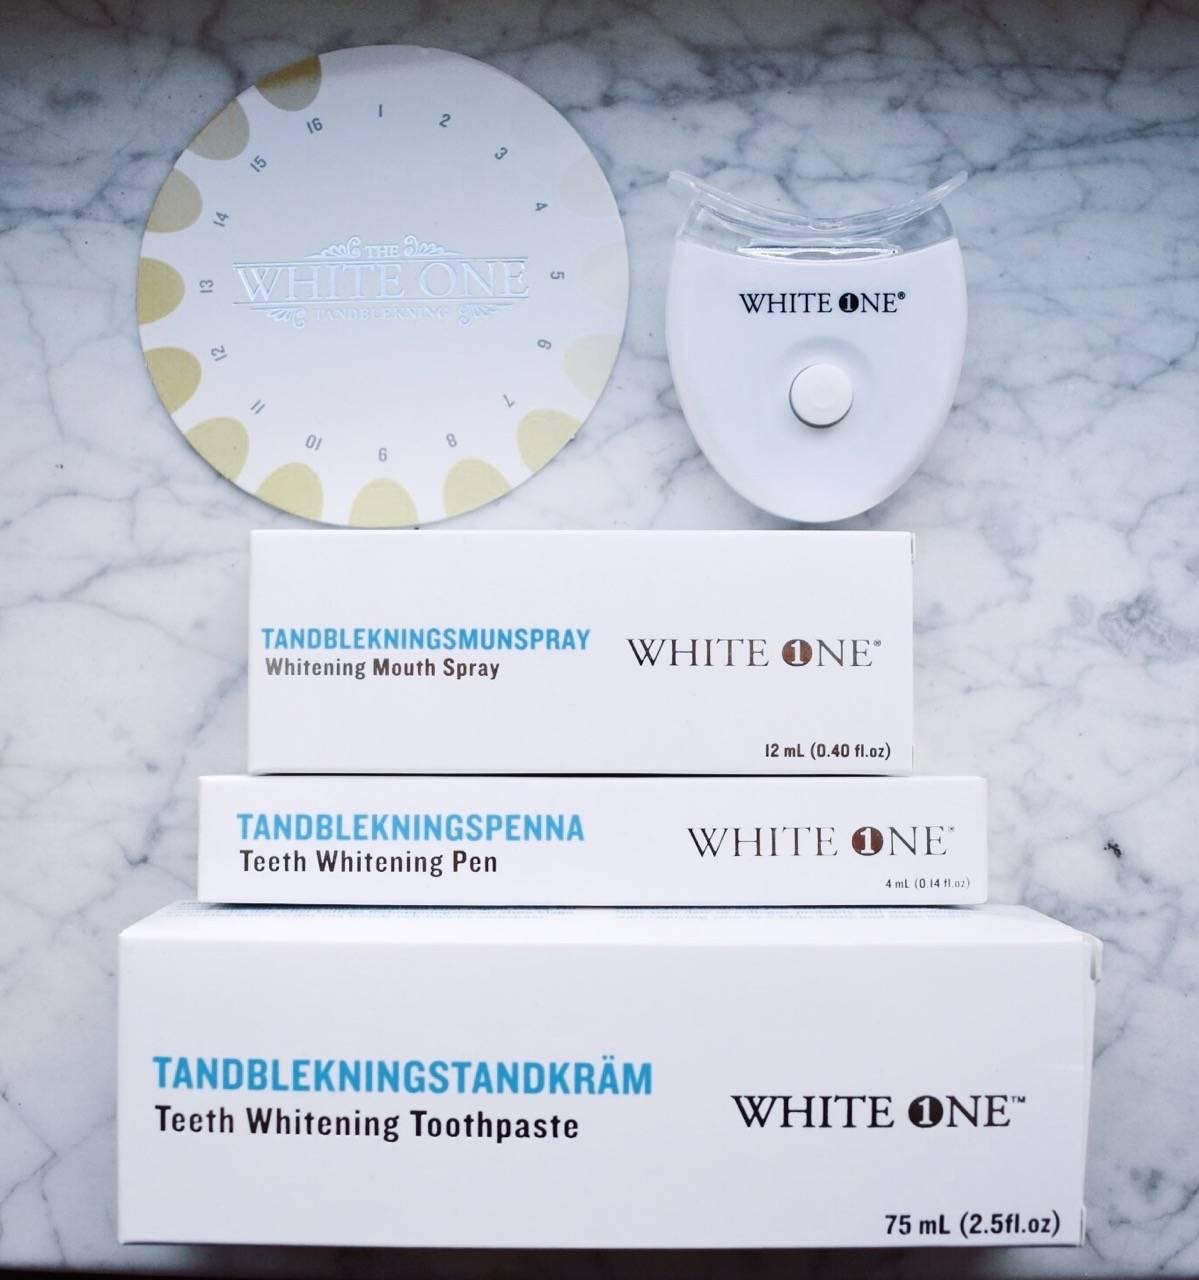 whiteone